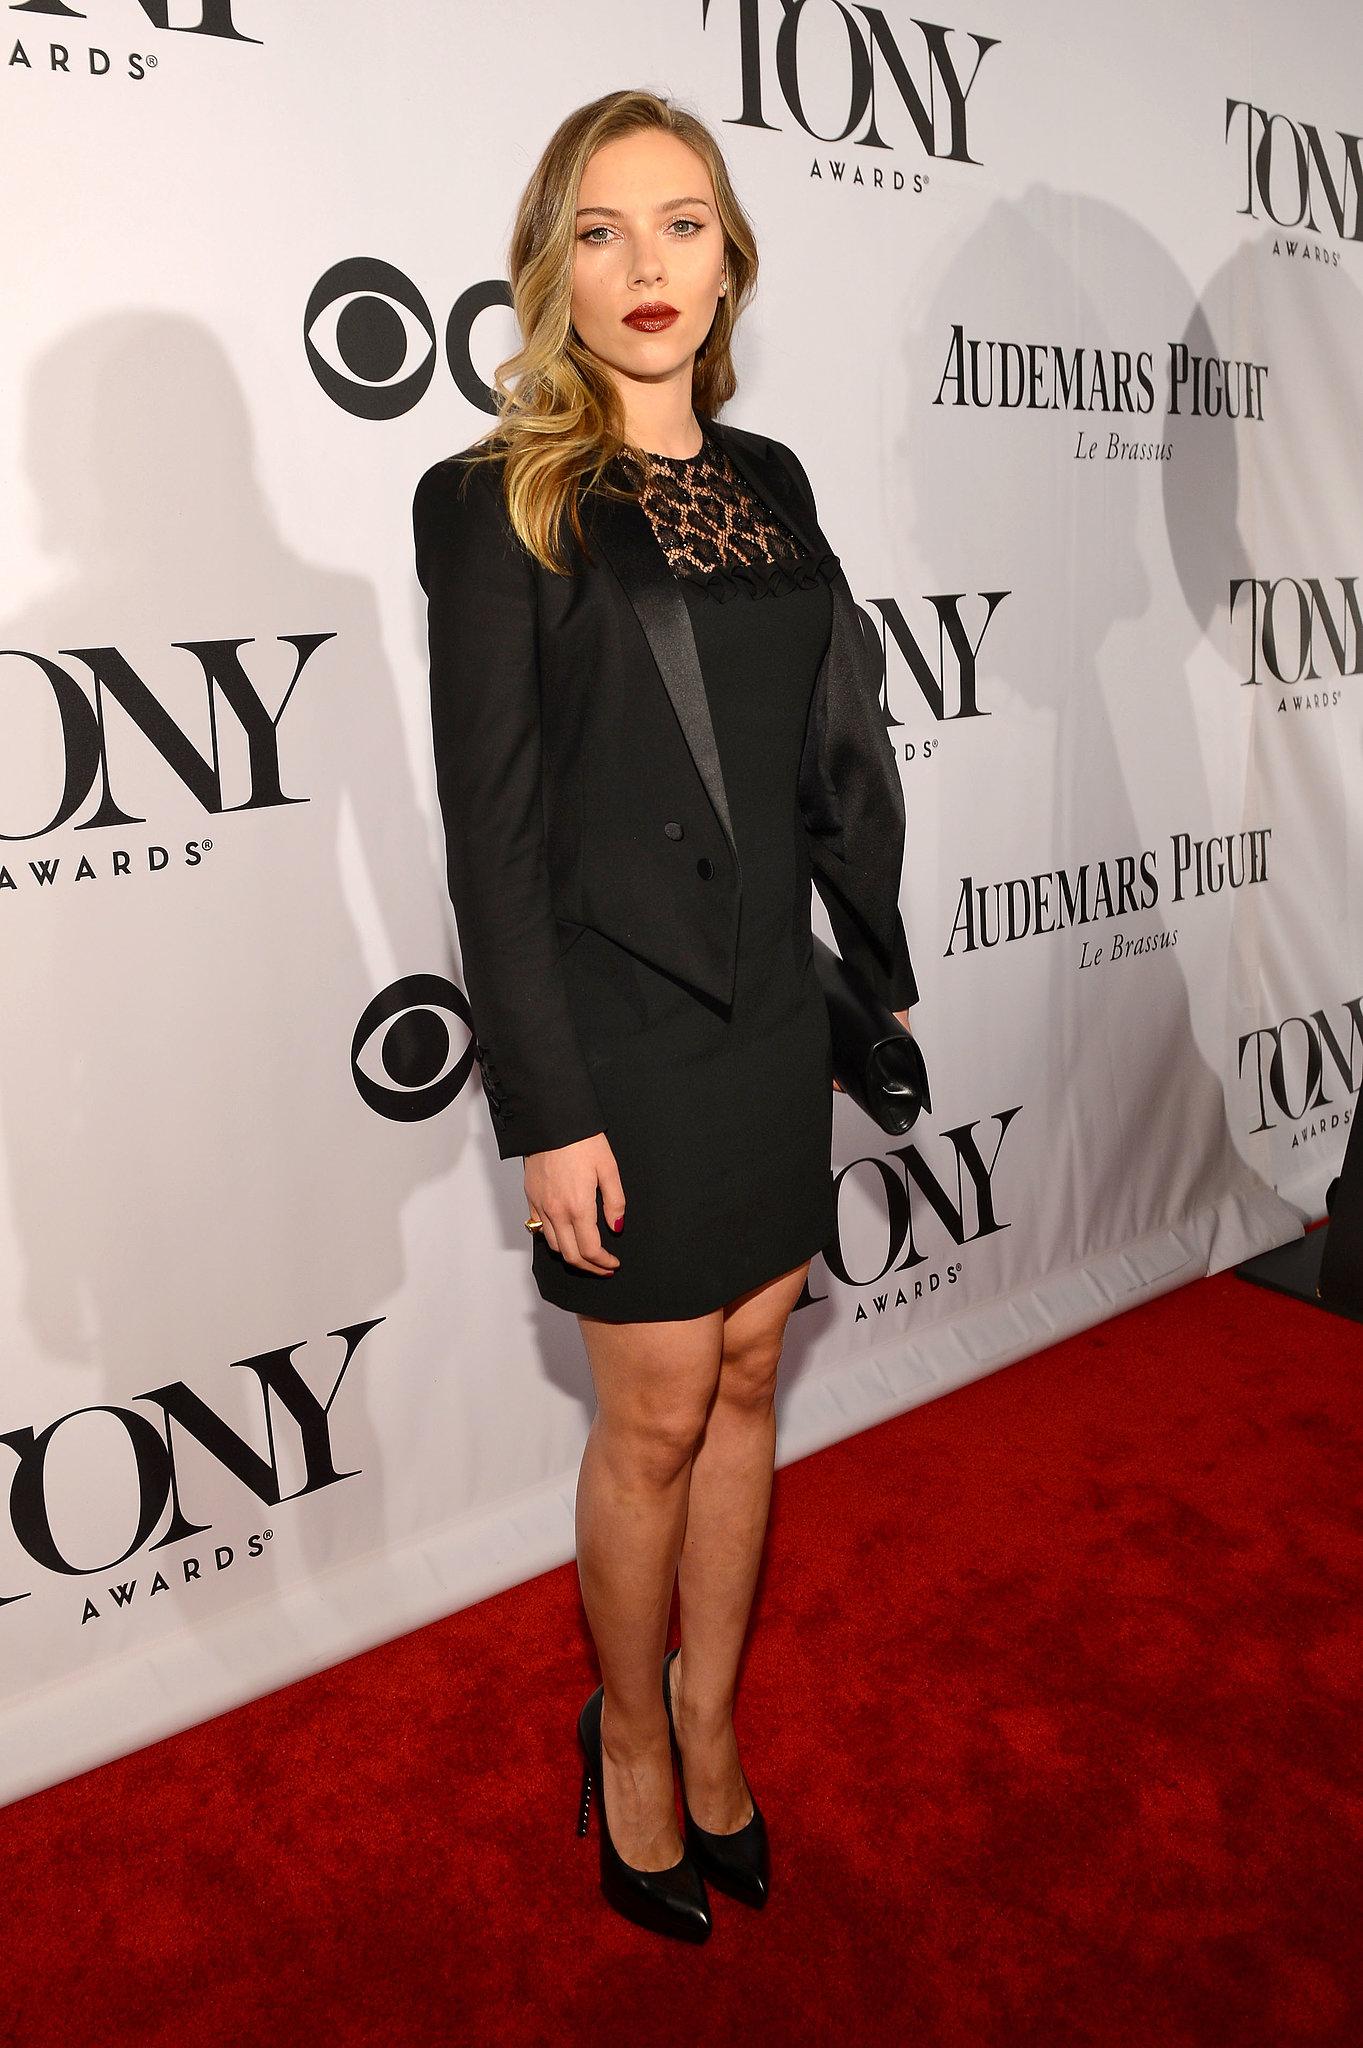 Scarlett Johansson wore Saint Laurent to the 2013 Tony Awards in New York.